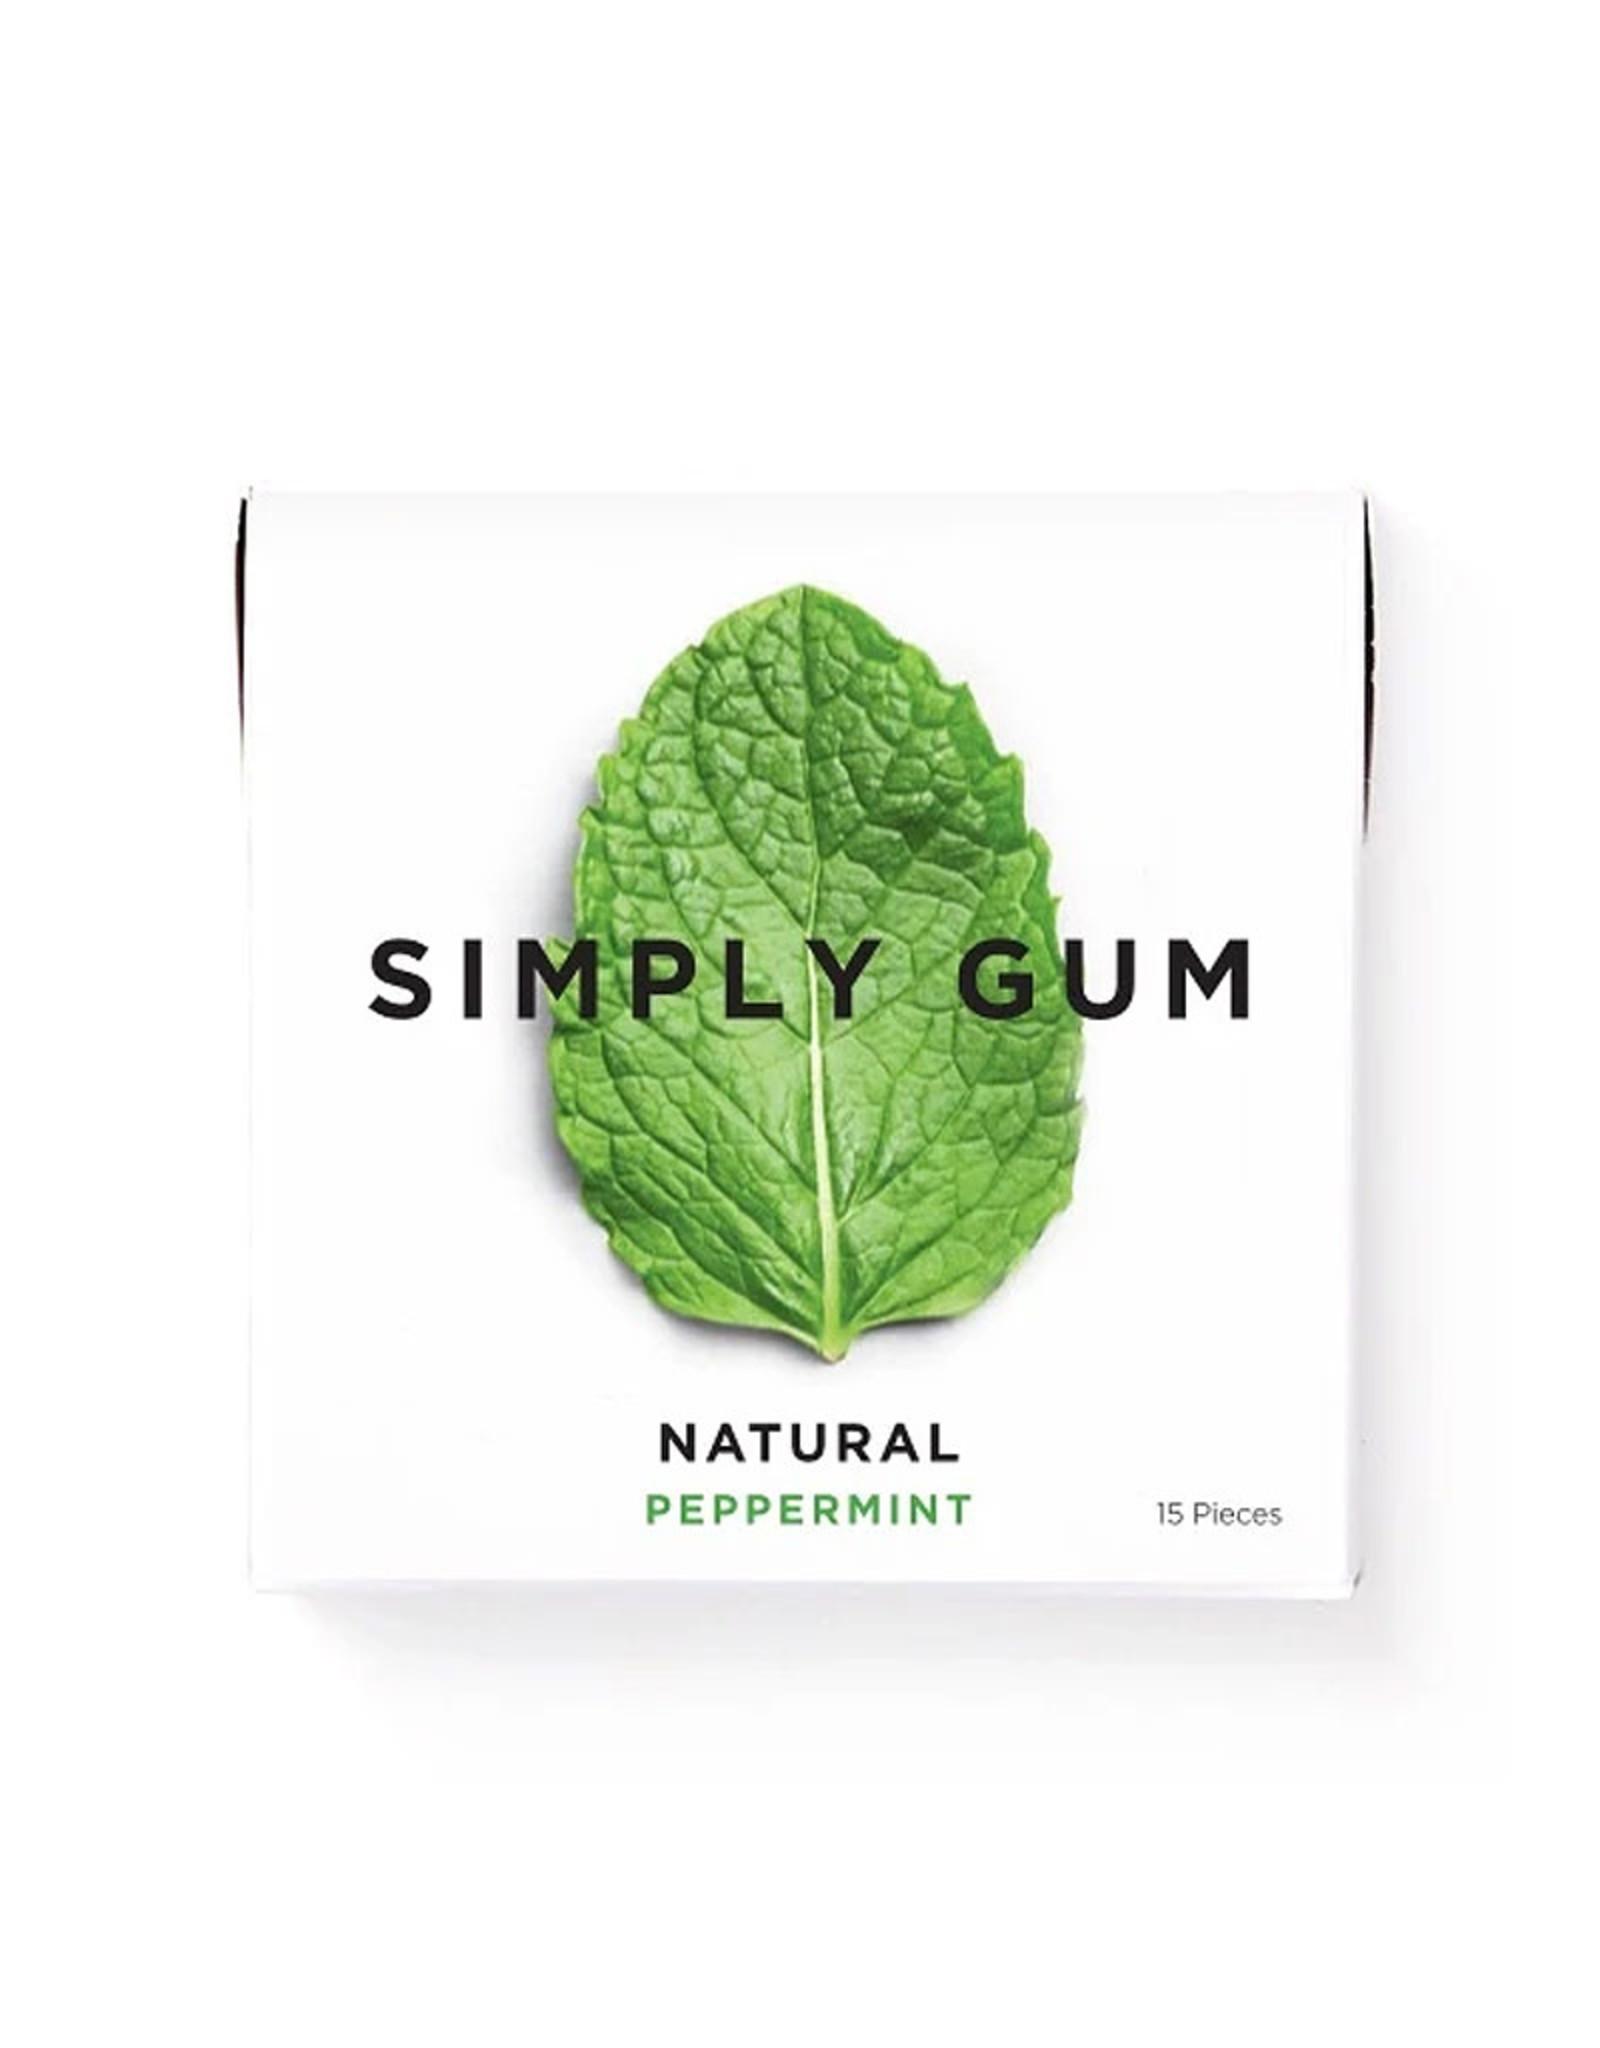 Simply Gum Simply Gum - Peppermint